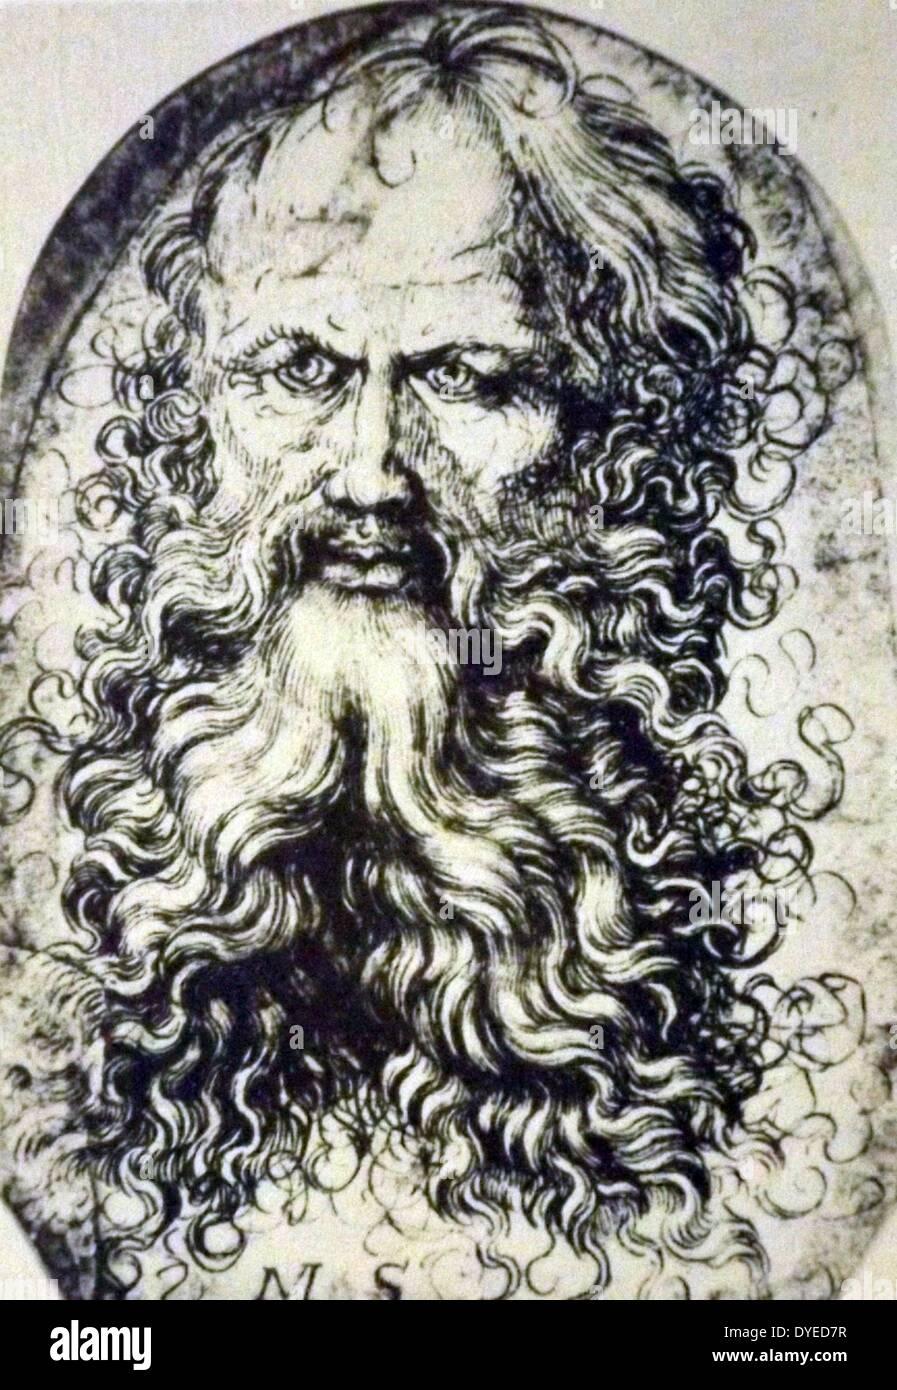 Head of a Bearded Man - Stock Image